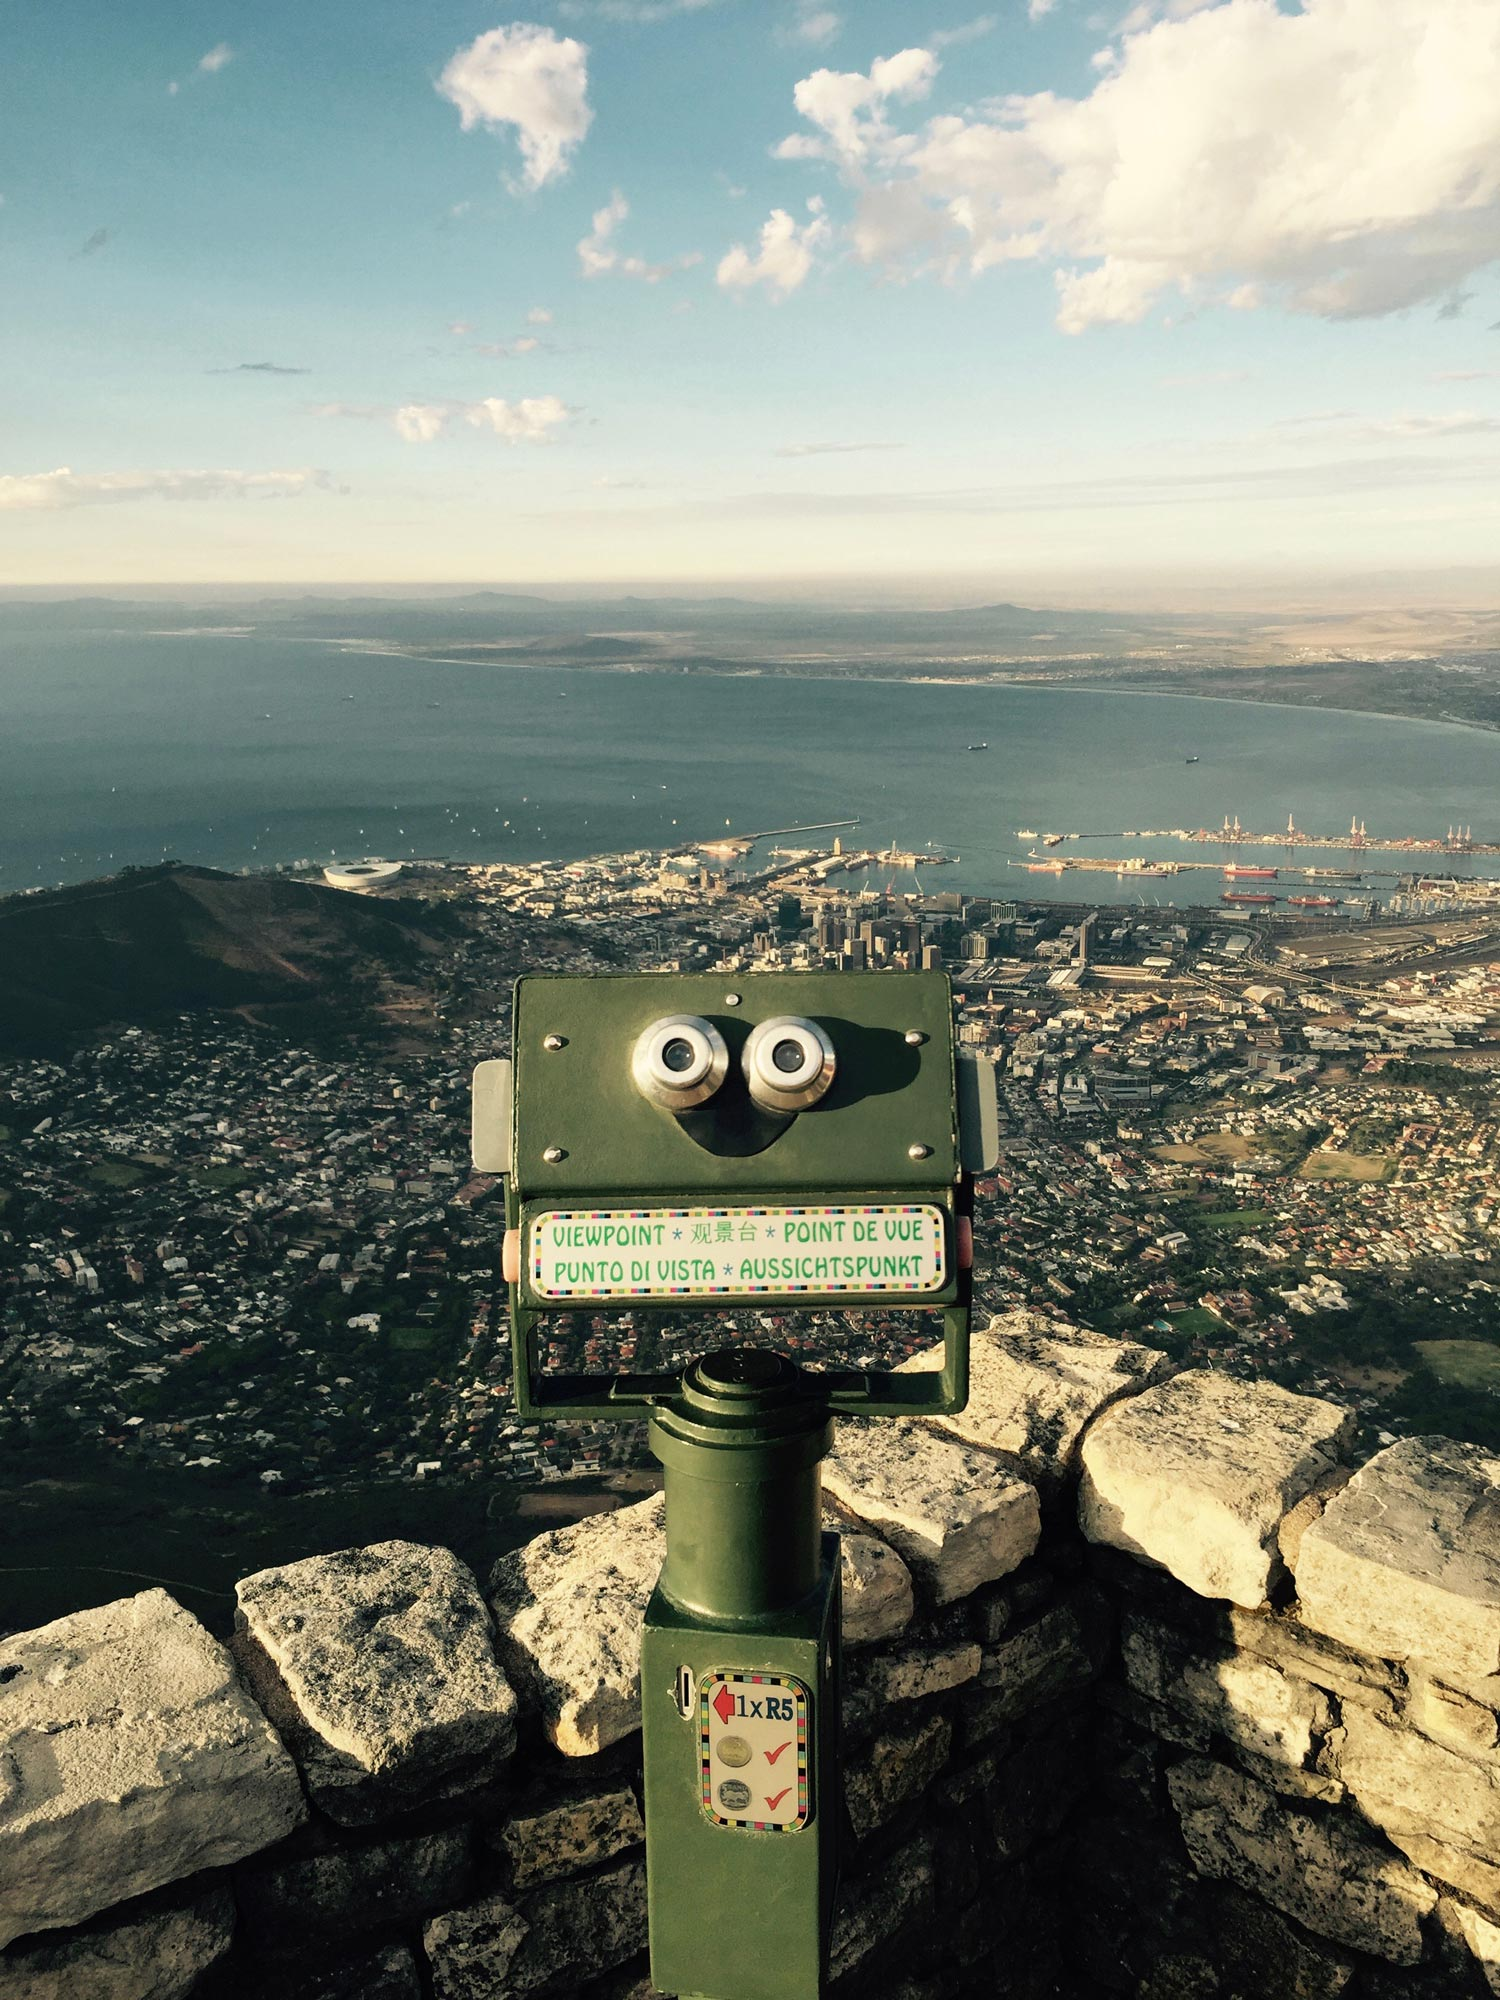 Cape-Town-ShootIMG_7889.jpg